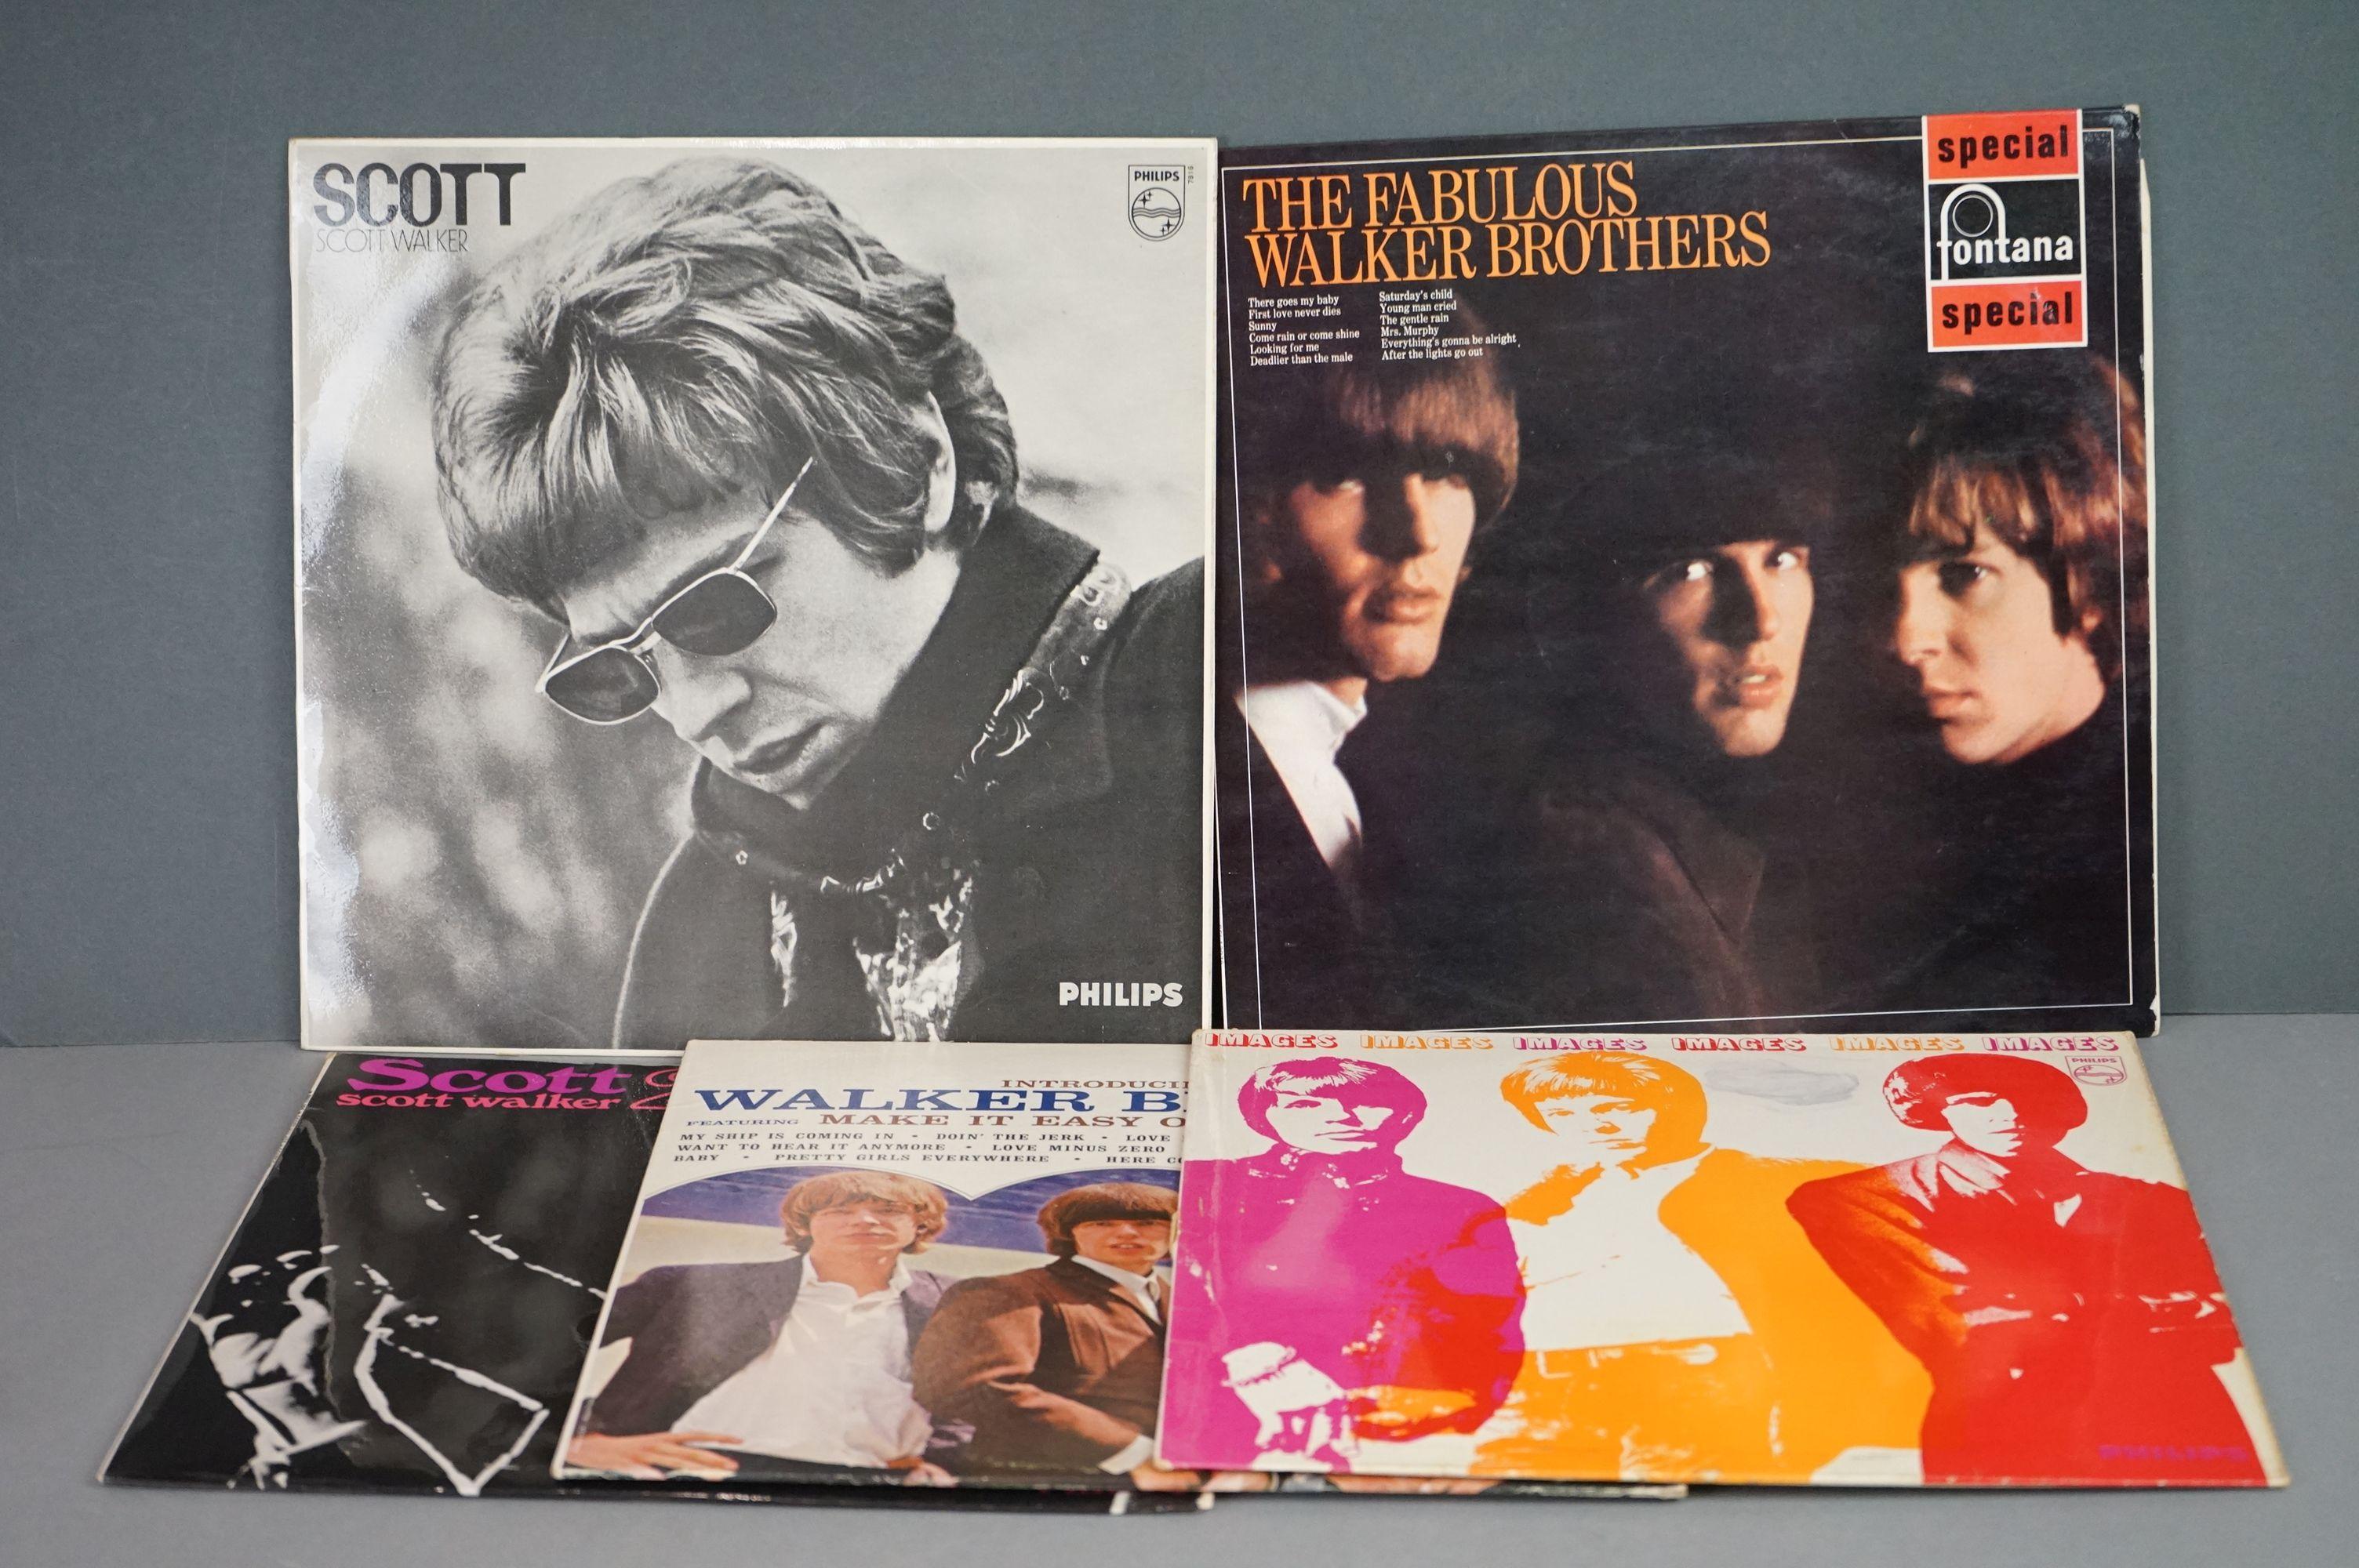 Vinyl - Five Walker Brothers vinyl LP's to include Scott (Phillips Records BL 7816), The Fabulous